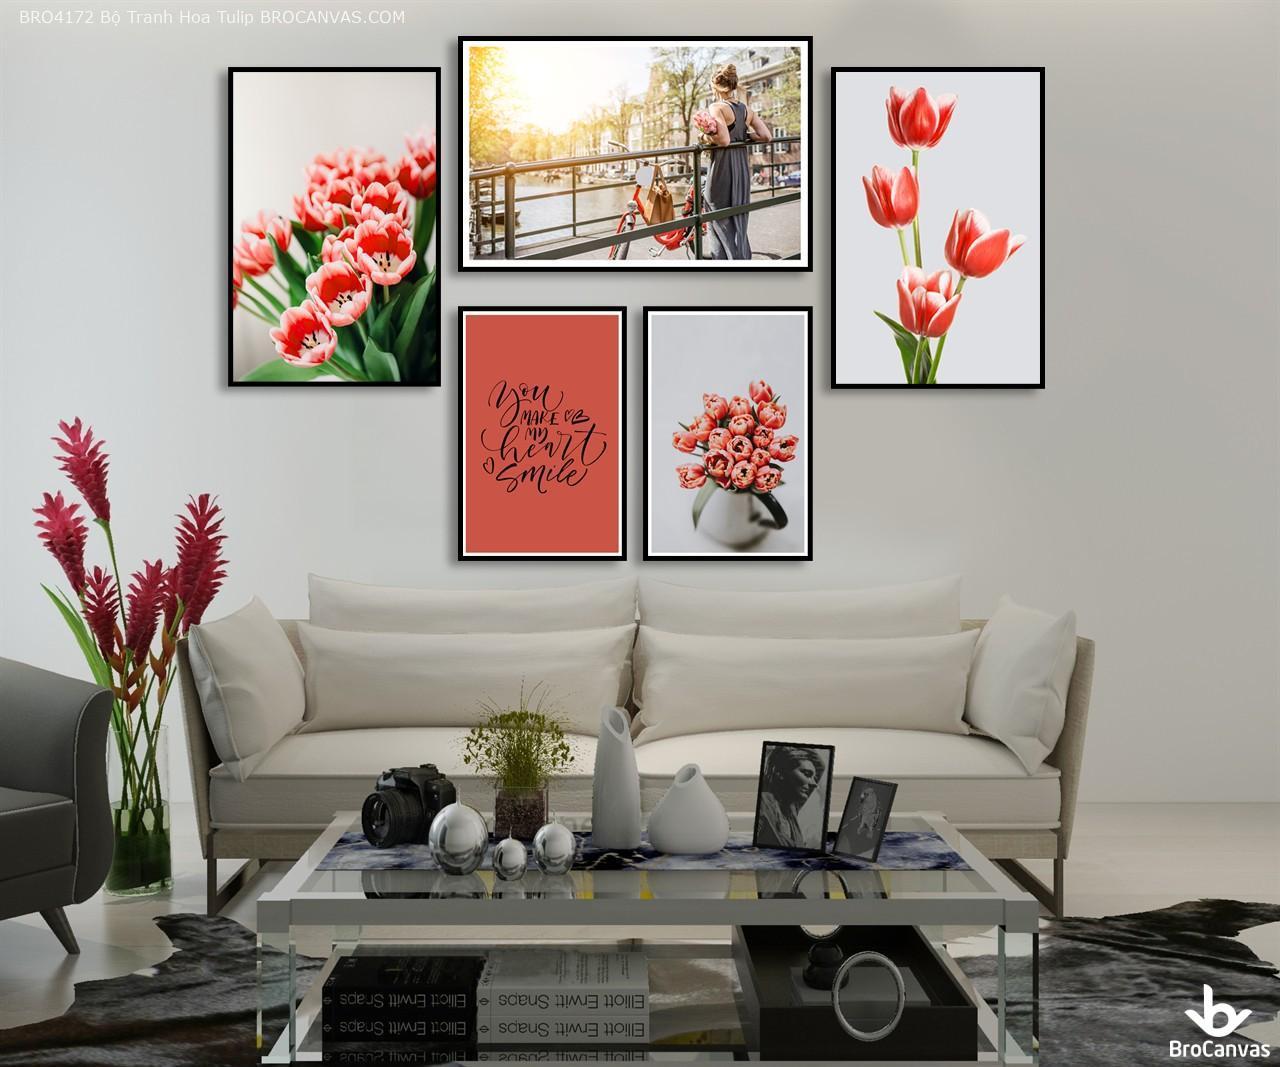 Bộ Tranh Hoa Tulip